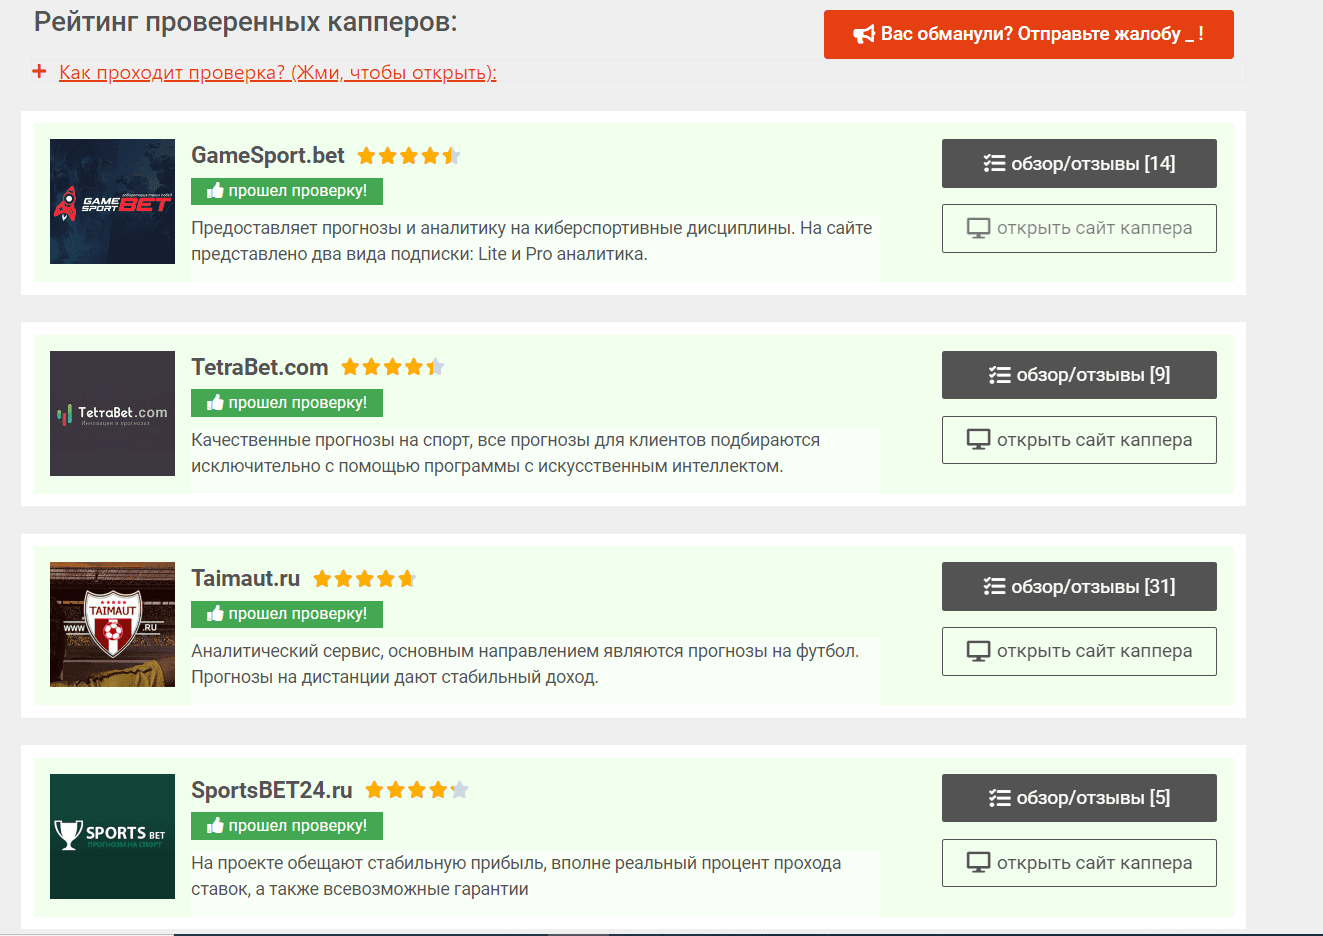 proverka top проверенные капперы